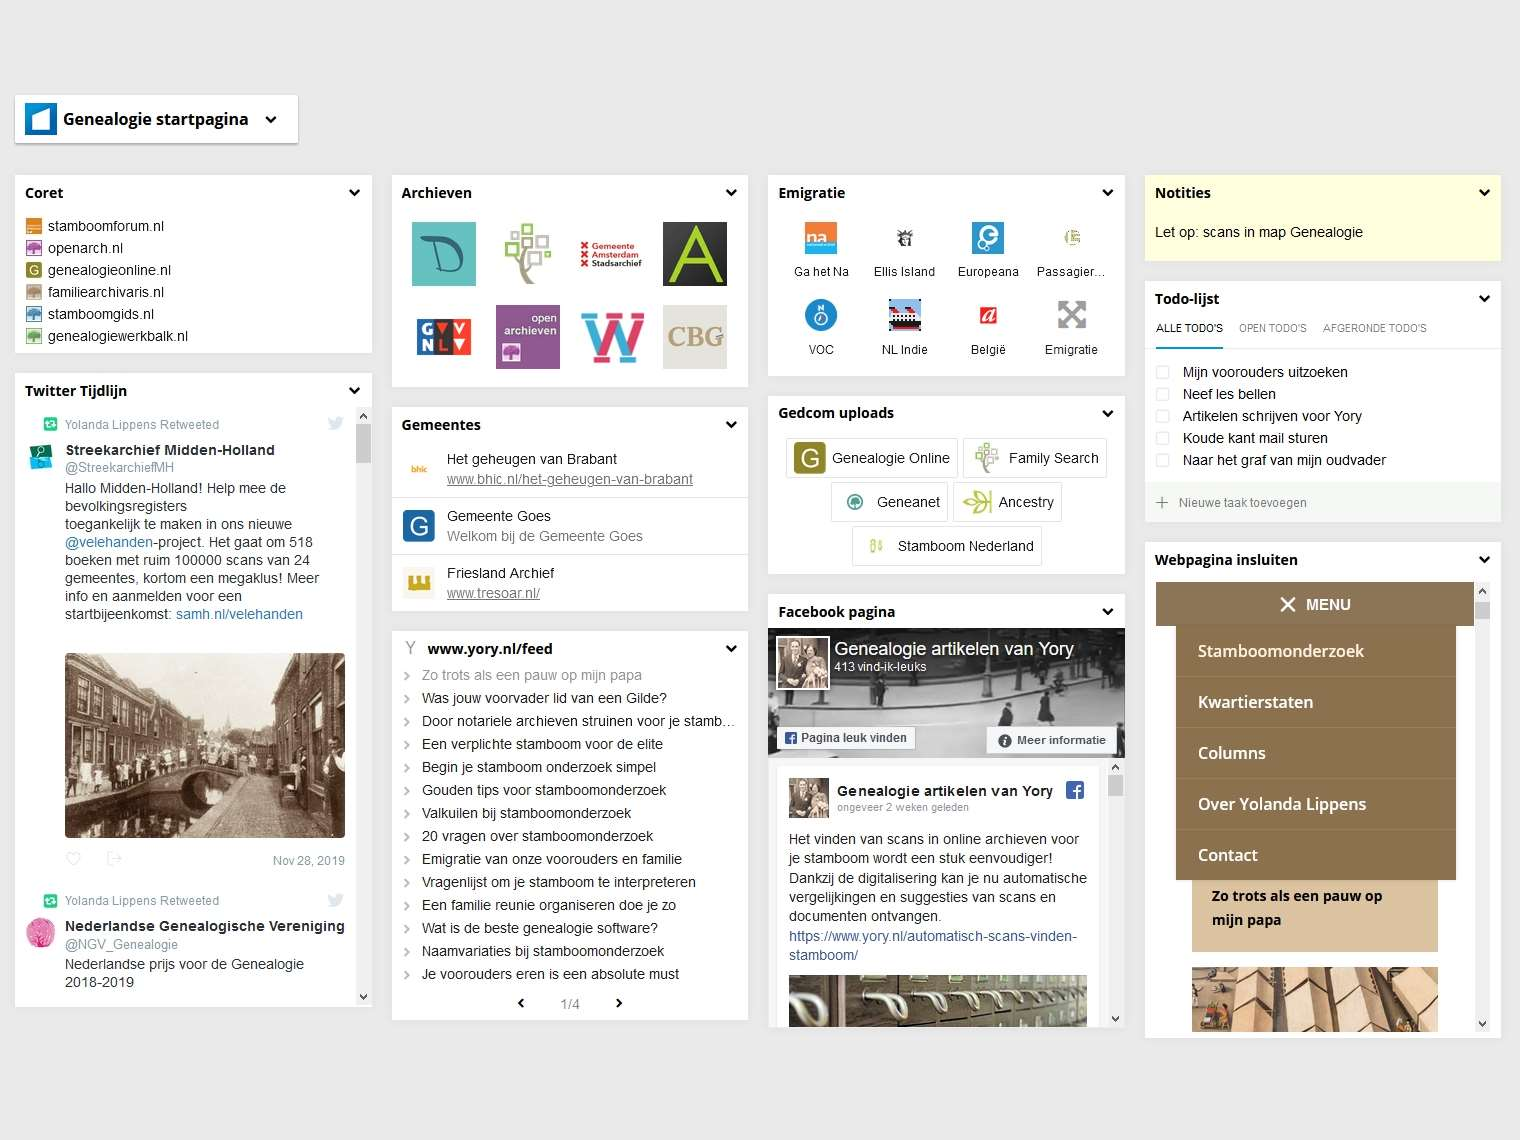 genealogie startpagina yolanda-lippens-yory